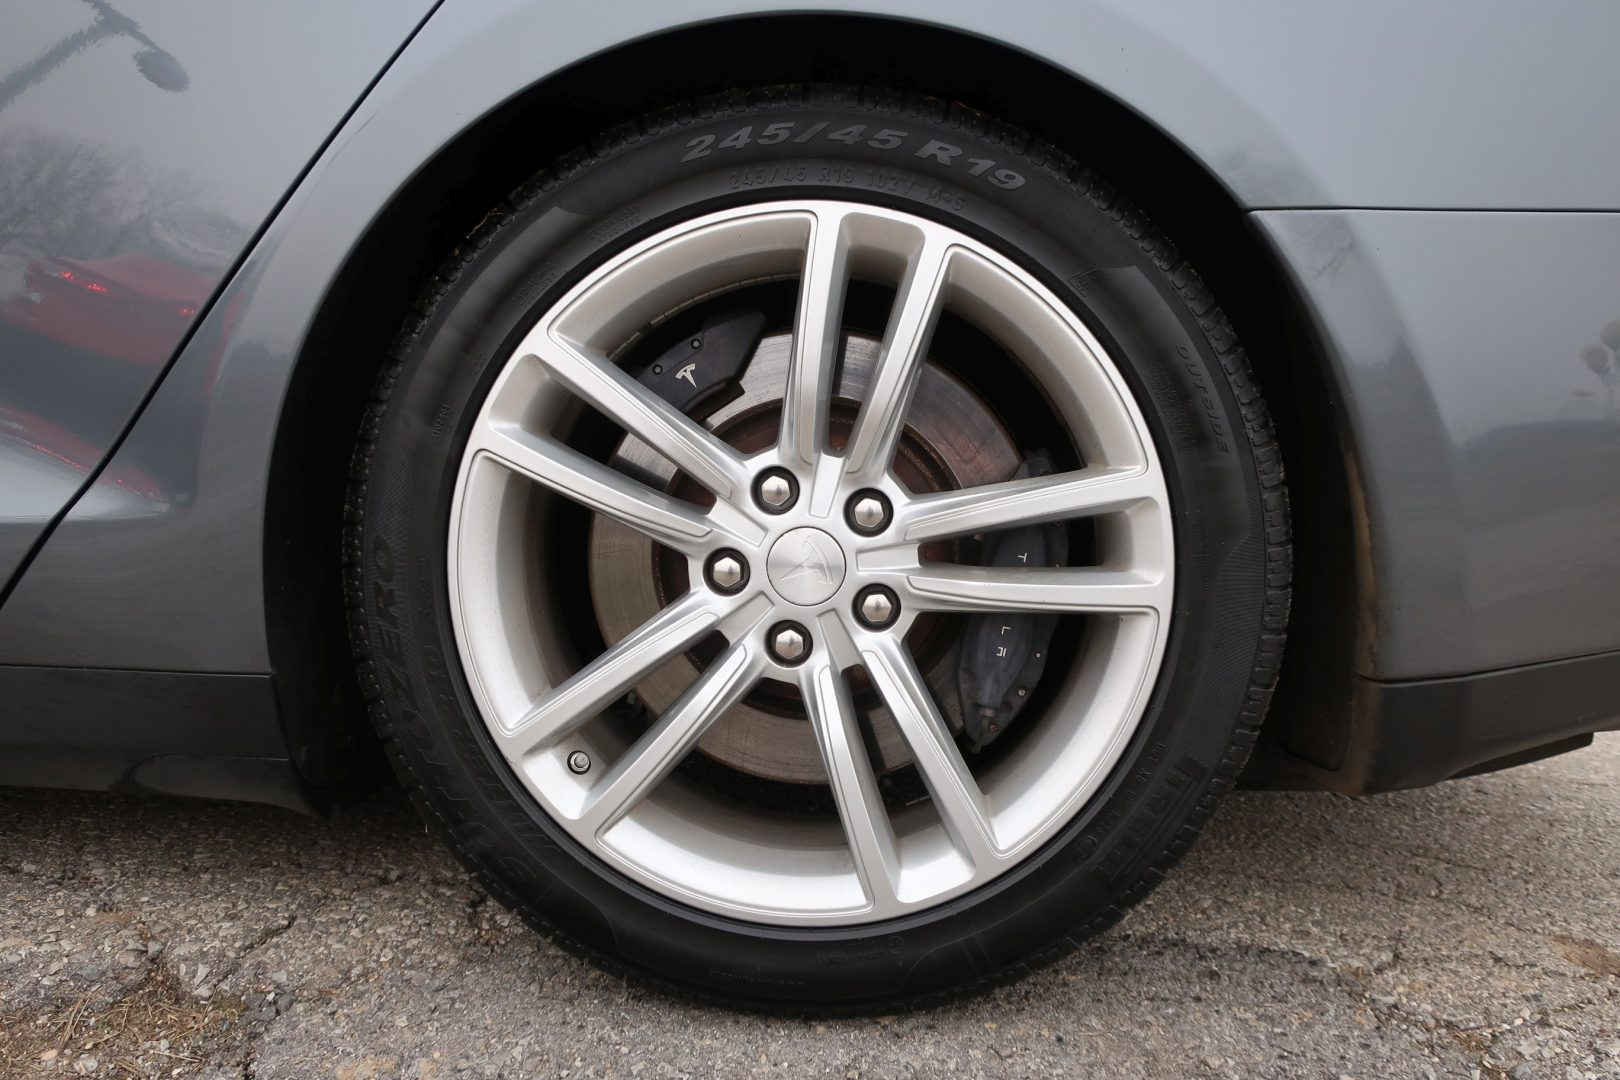 Veliki kotač – veća potrošnja